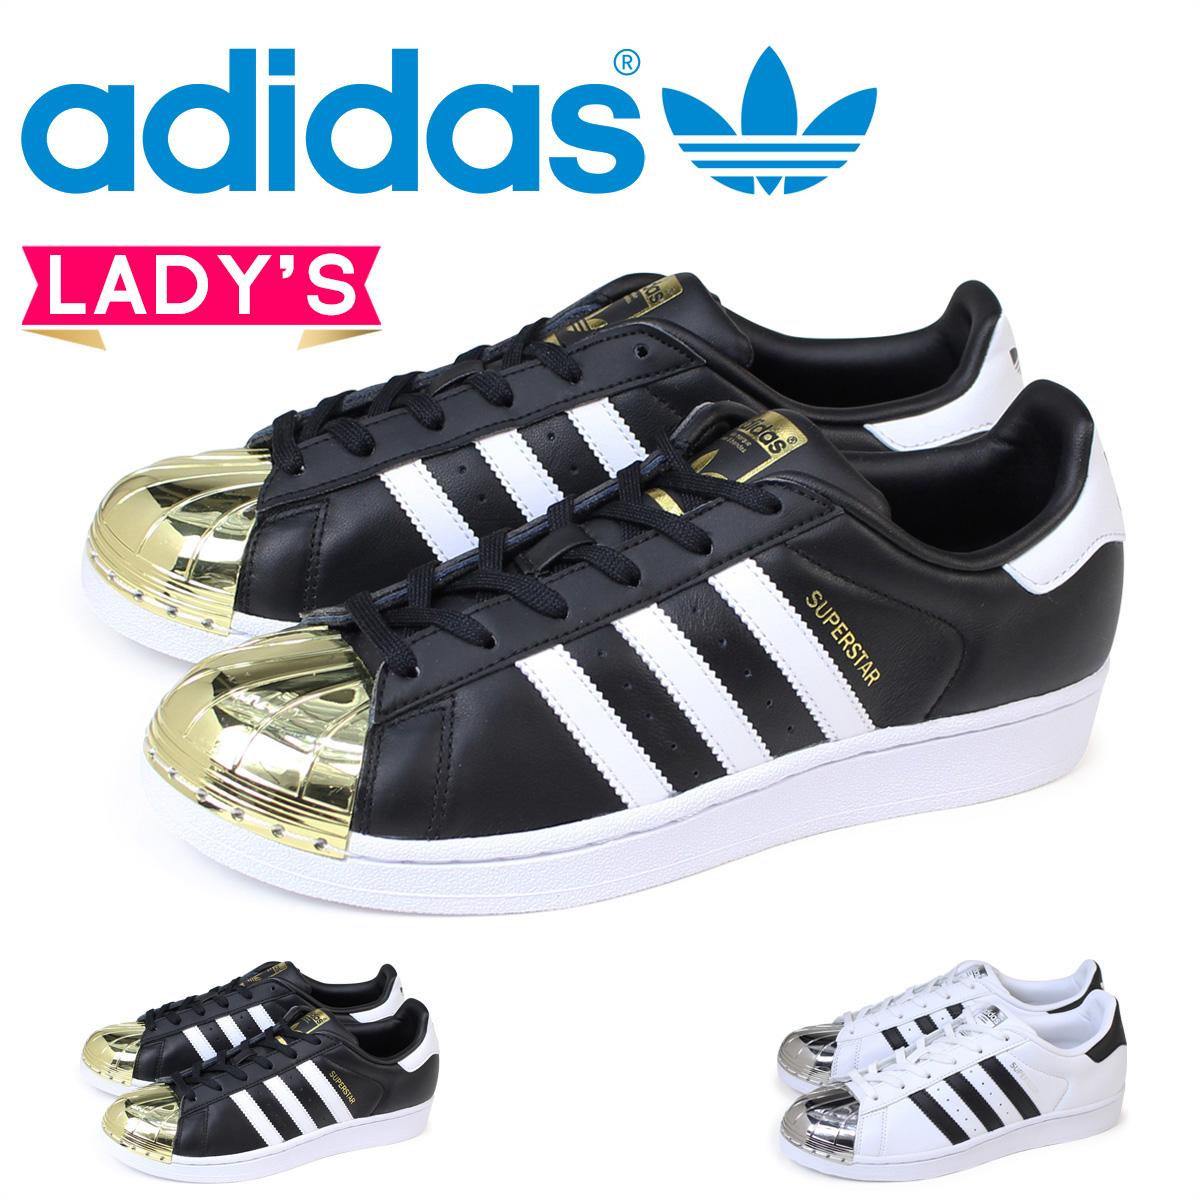 adidas スーパースター レディース スニーカー アディダス Originals SUPERSTAR METAL TOE W BB5114 BB5115 靴 ホワイト ブラック オリジナルス